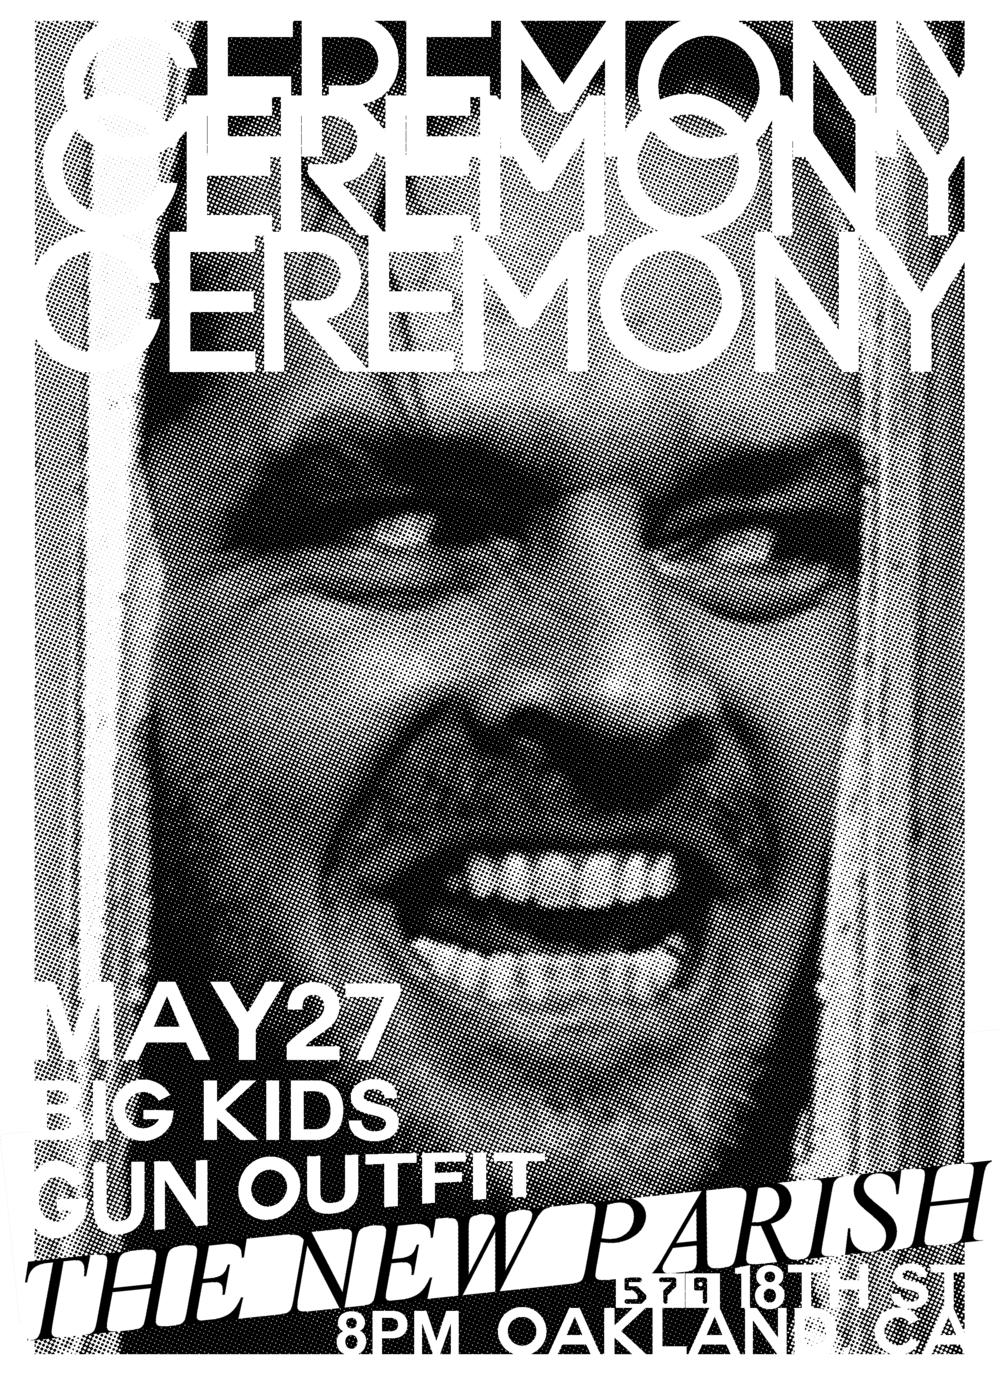 Punk bands, Local Bay Area, CA rock show flyer